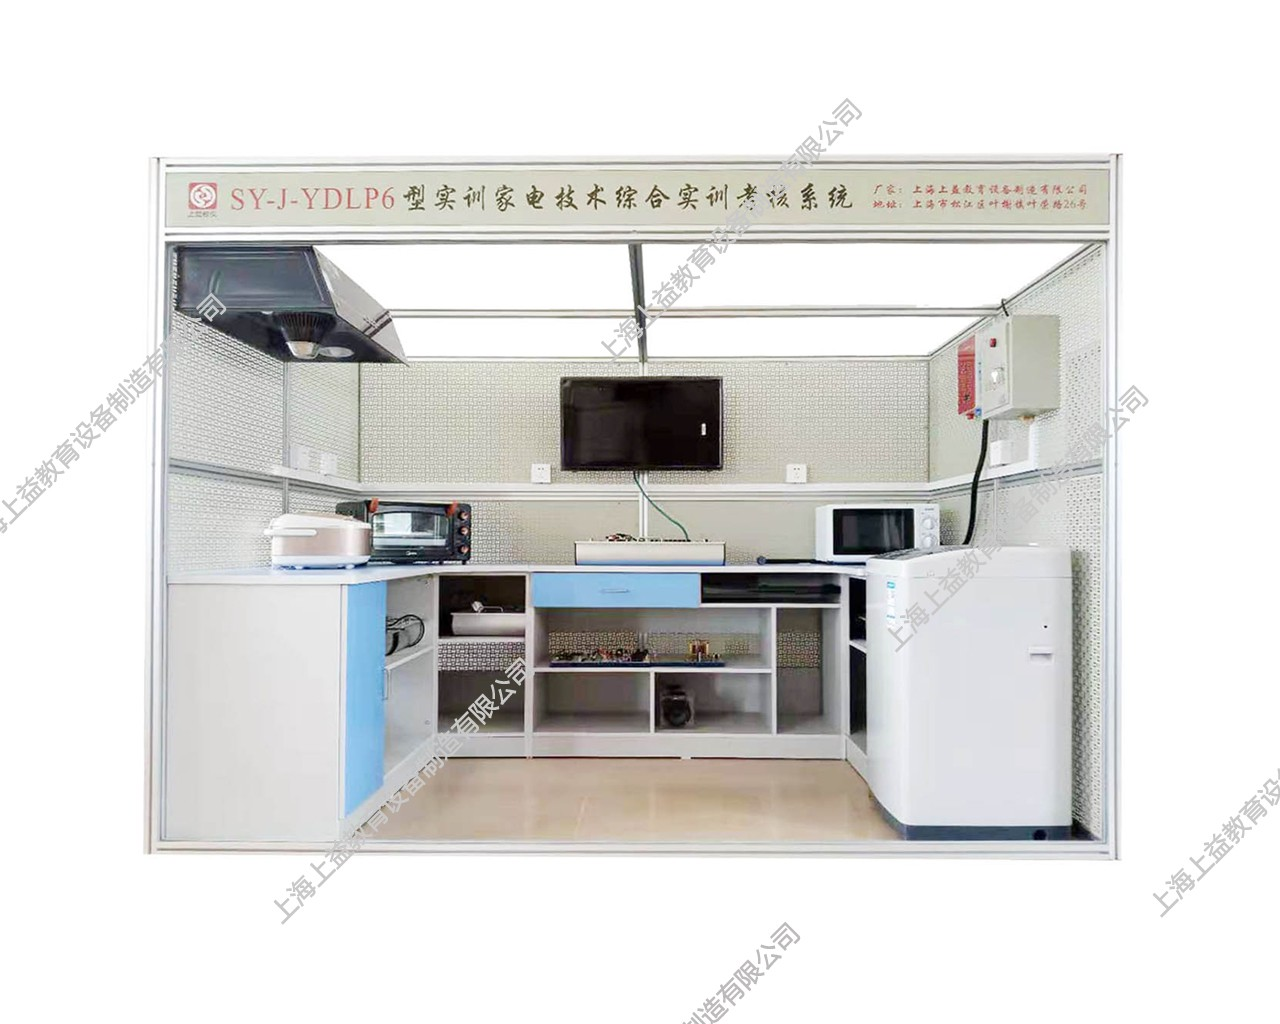 SY-JYDLP6型 家电技术综合wwwlehu8vip系统